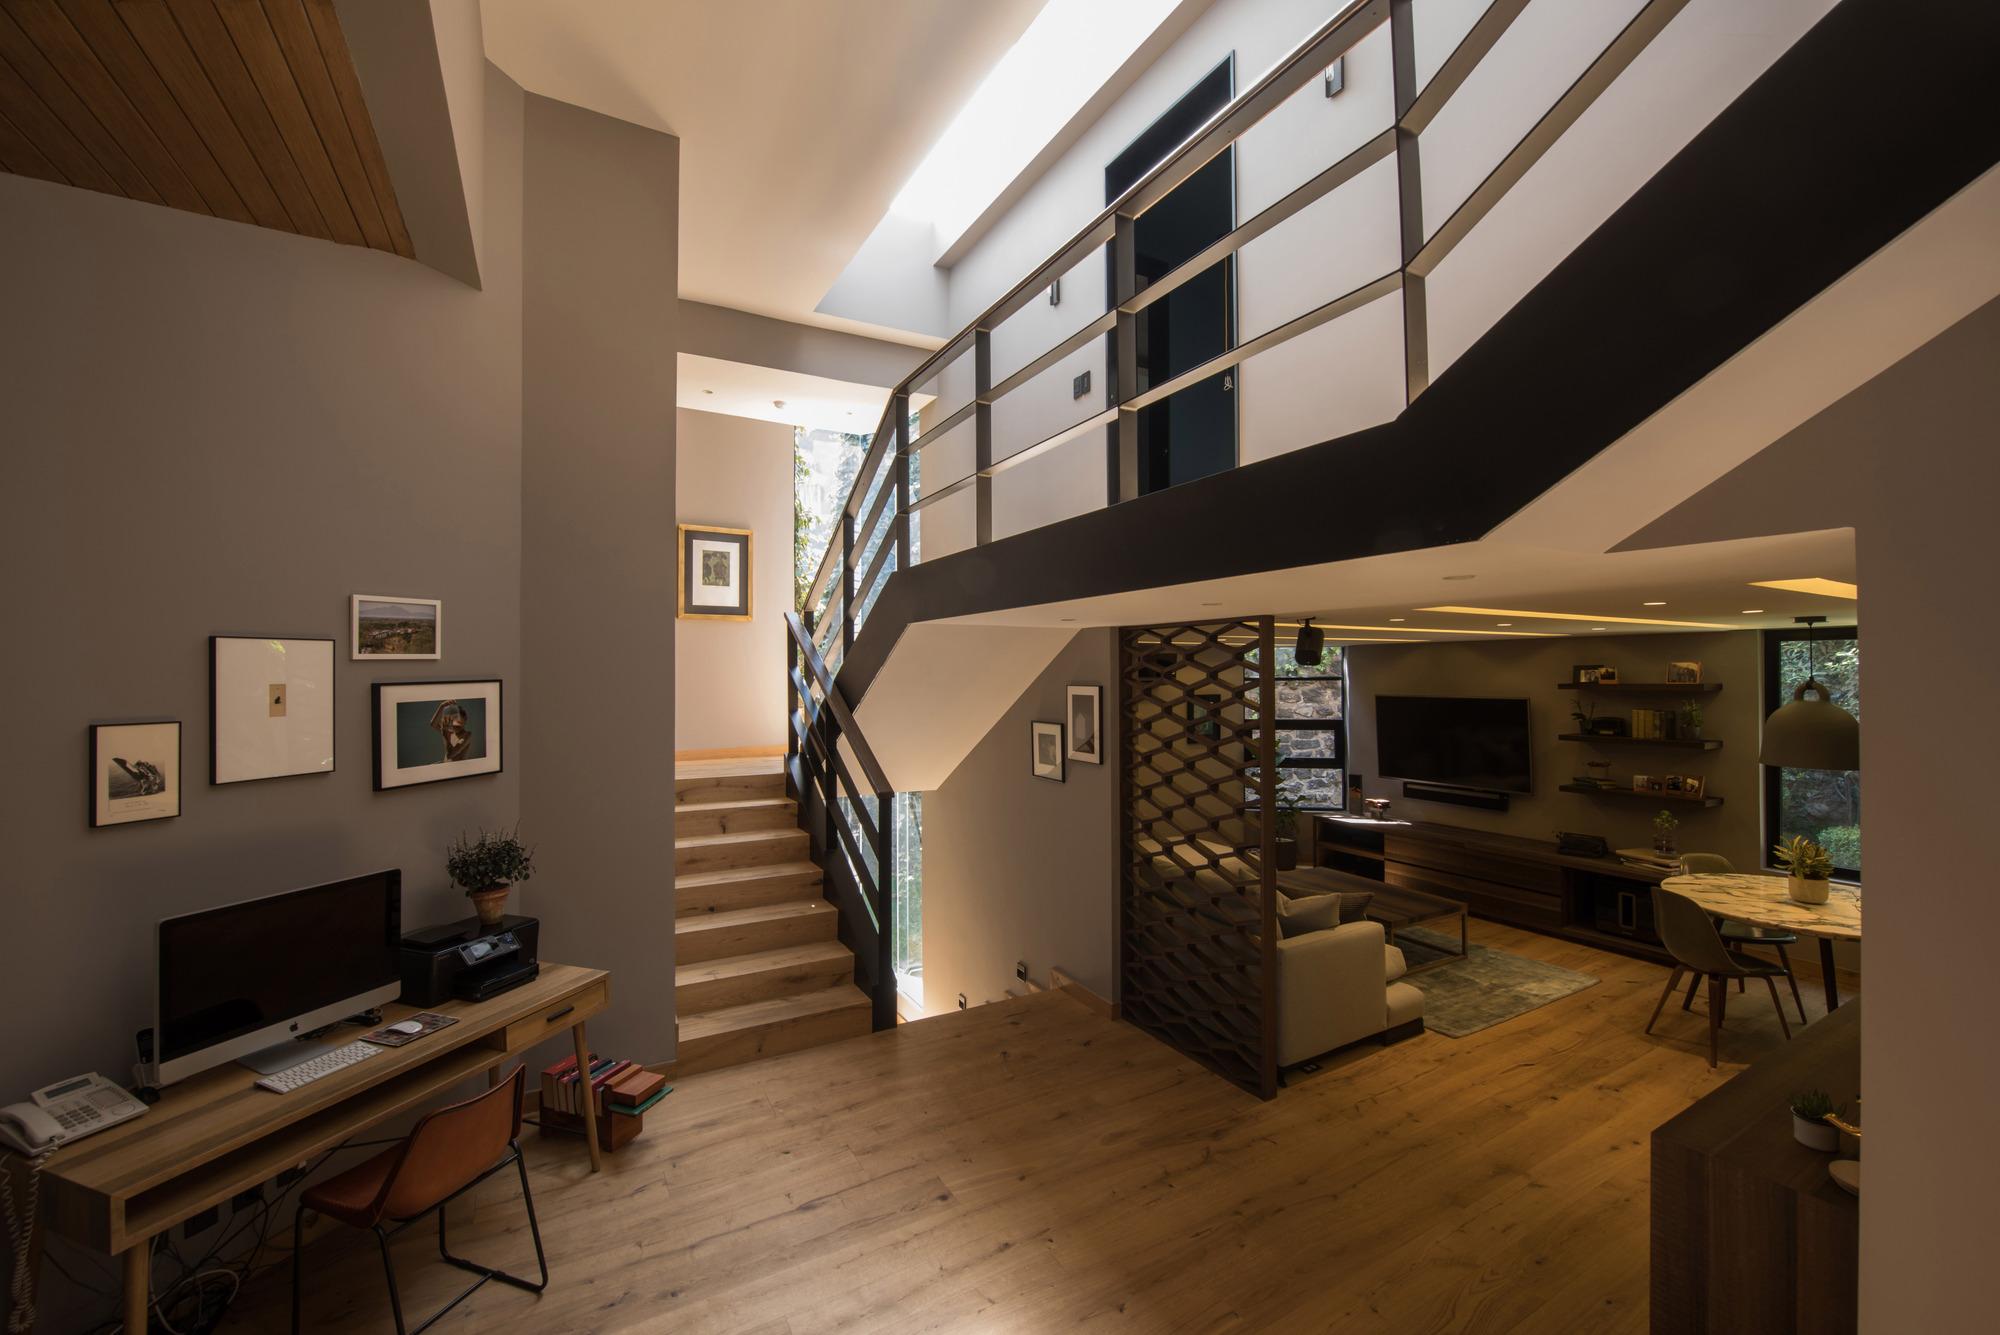 Gallery of casa ar arco arquitectura contempor nea 4 for Arquitectura contemporanea casas